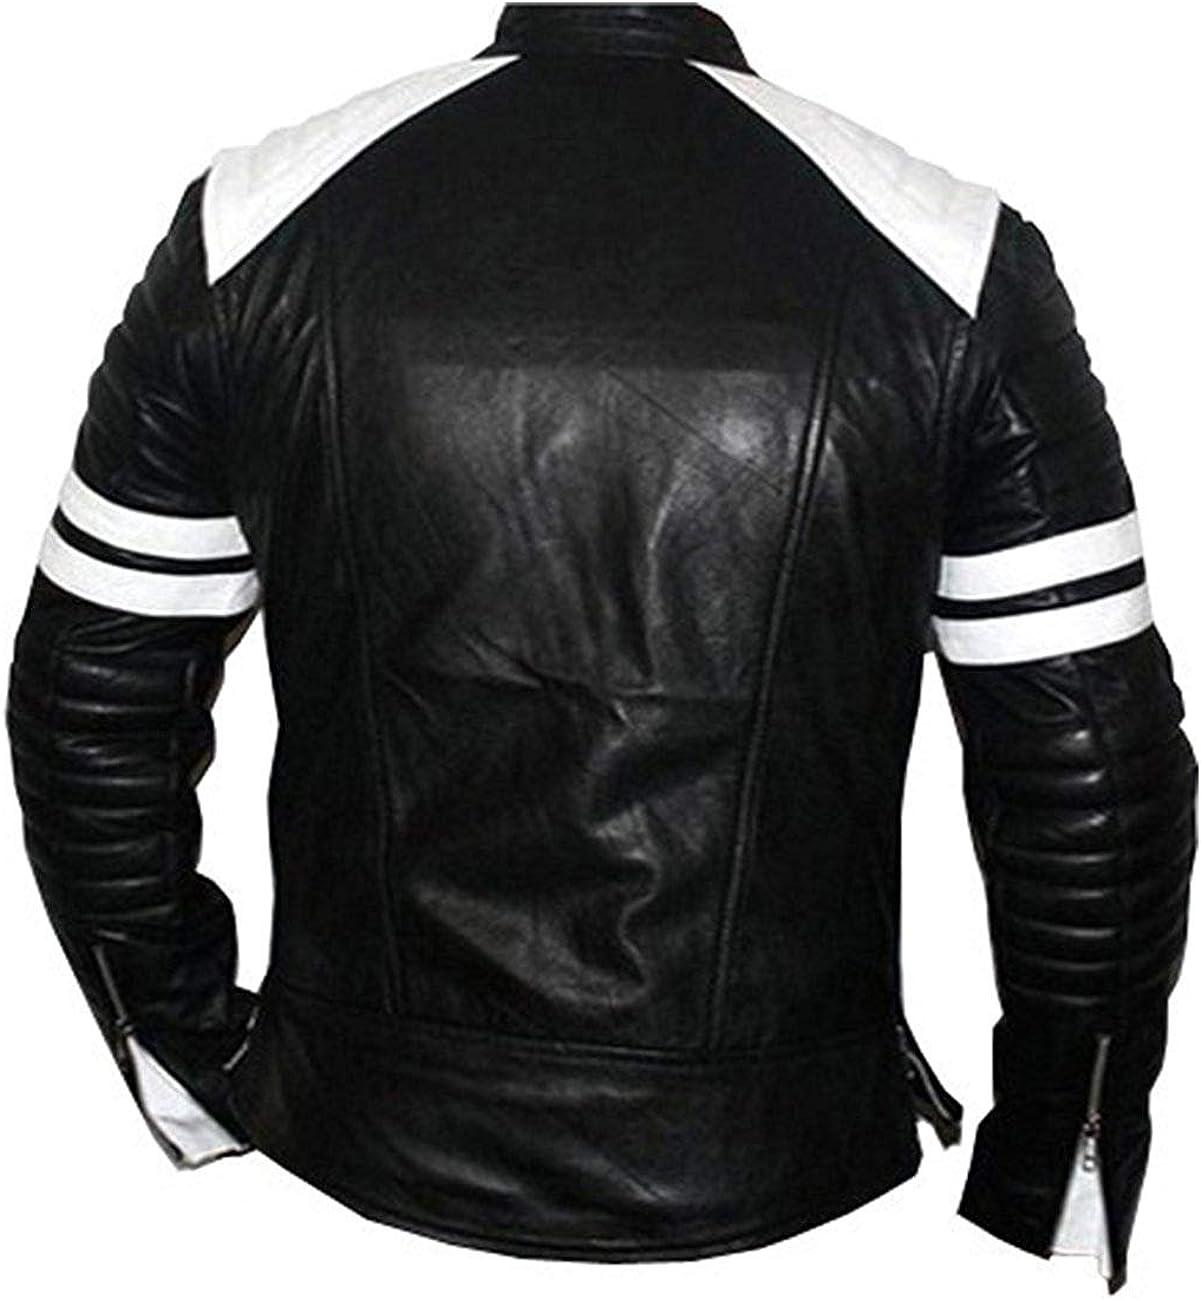 Mens Brad Pitt Black and White Lining Biker Leather Jacket 2XS to 3XL